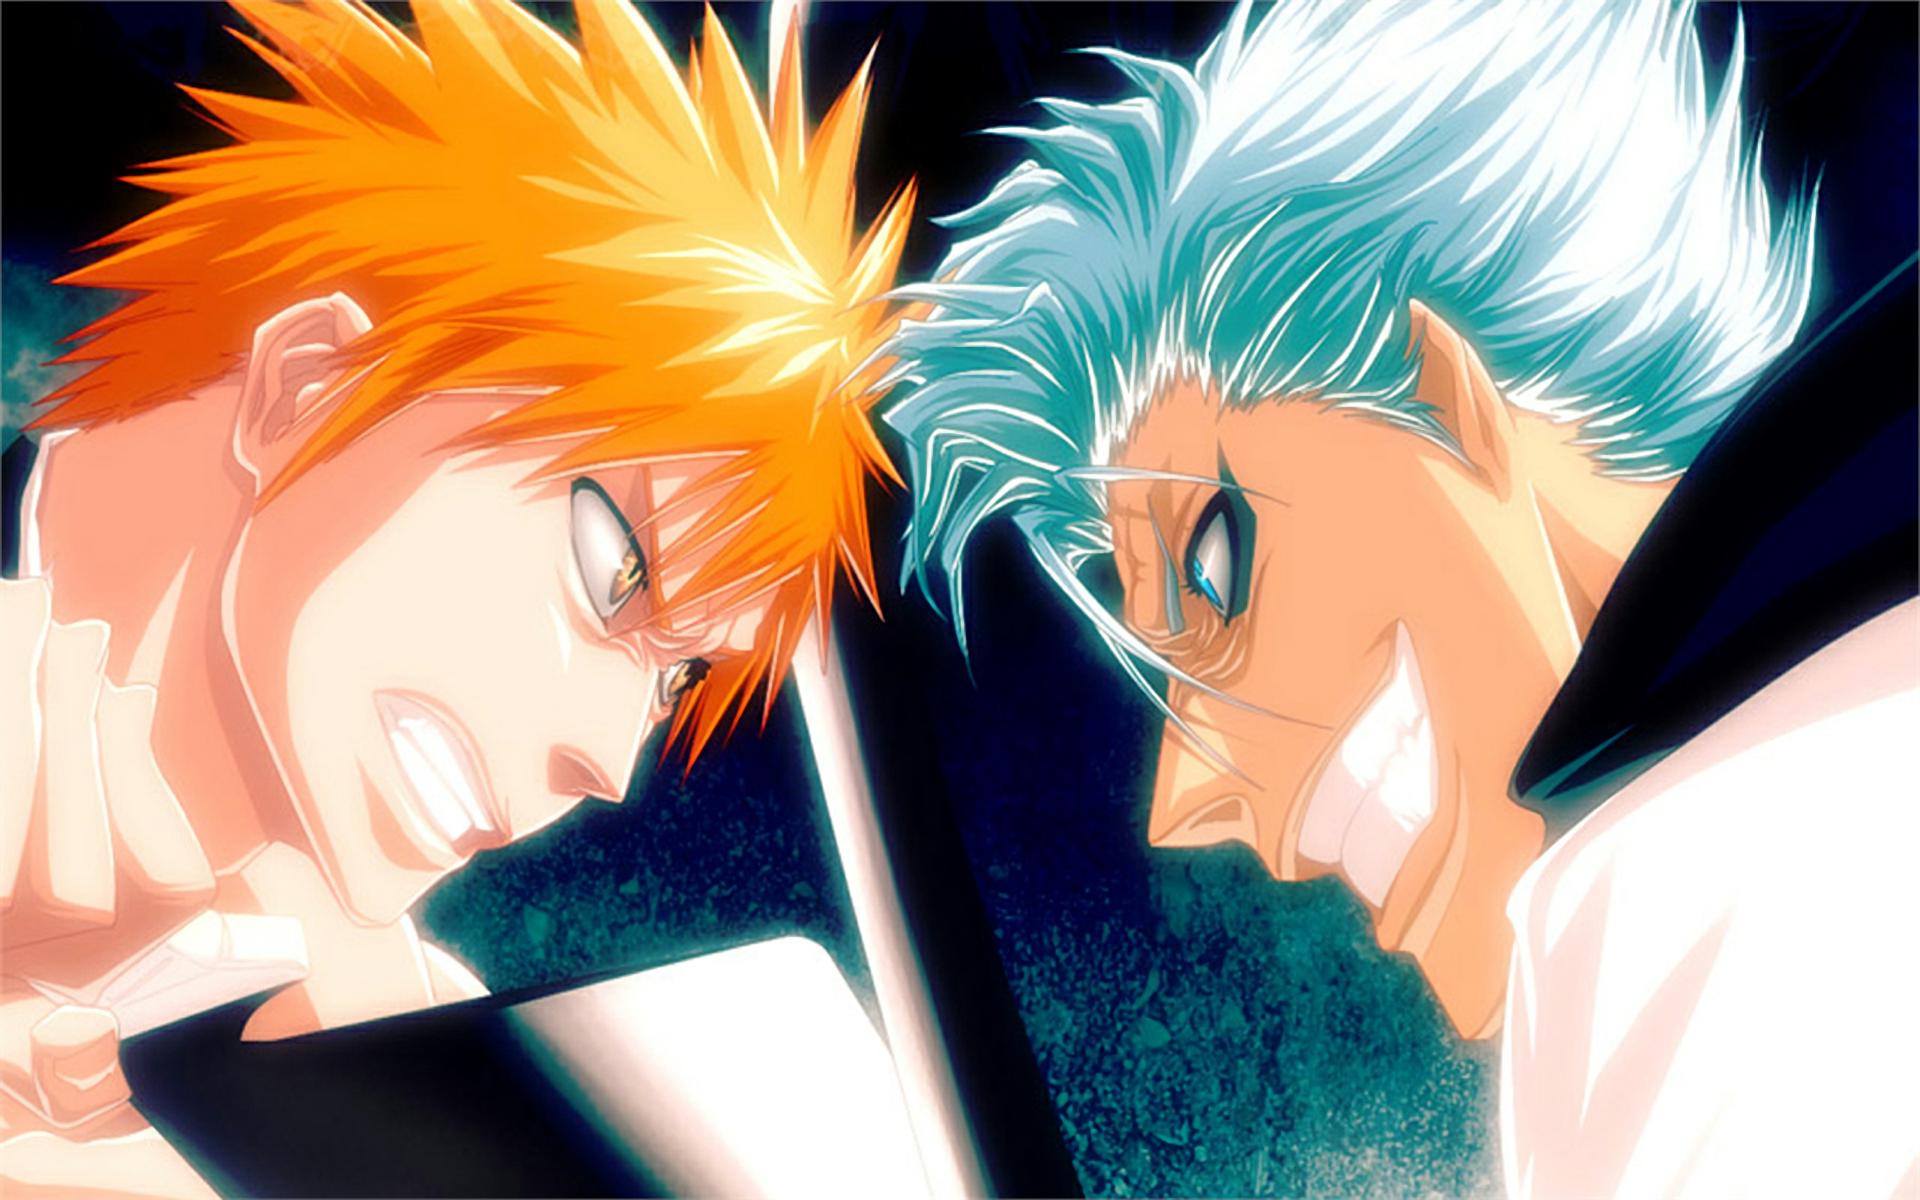 Anime Bleach Zaraki Kenpachi And Background Wallpaper